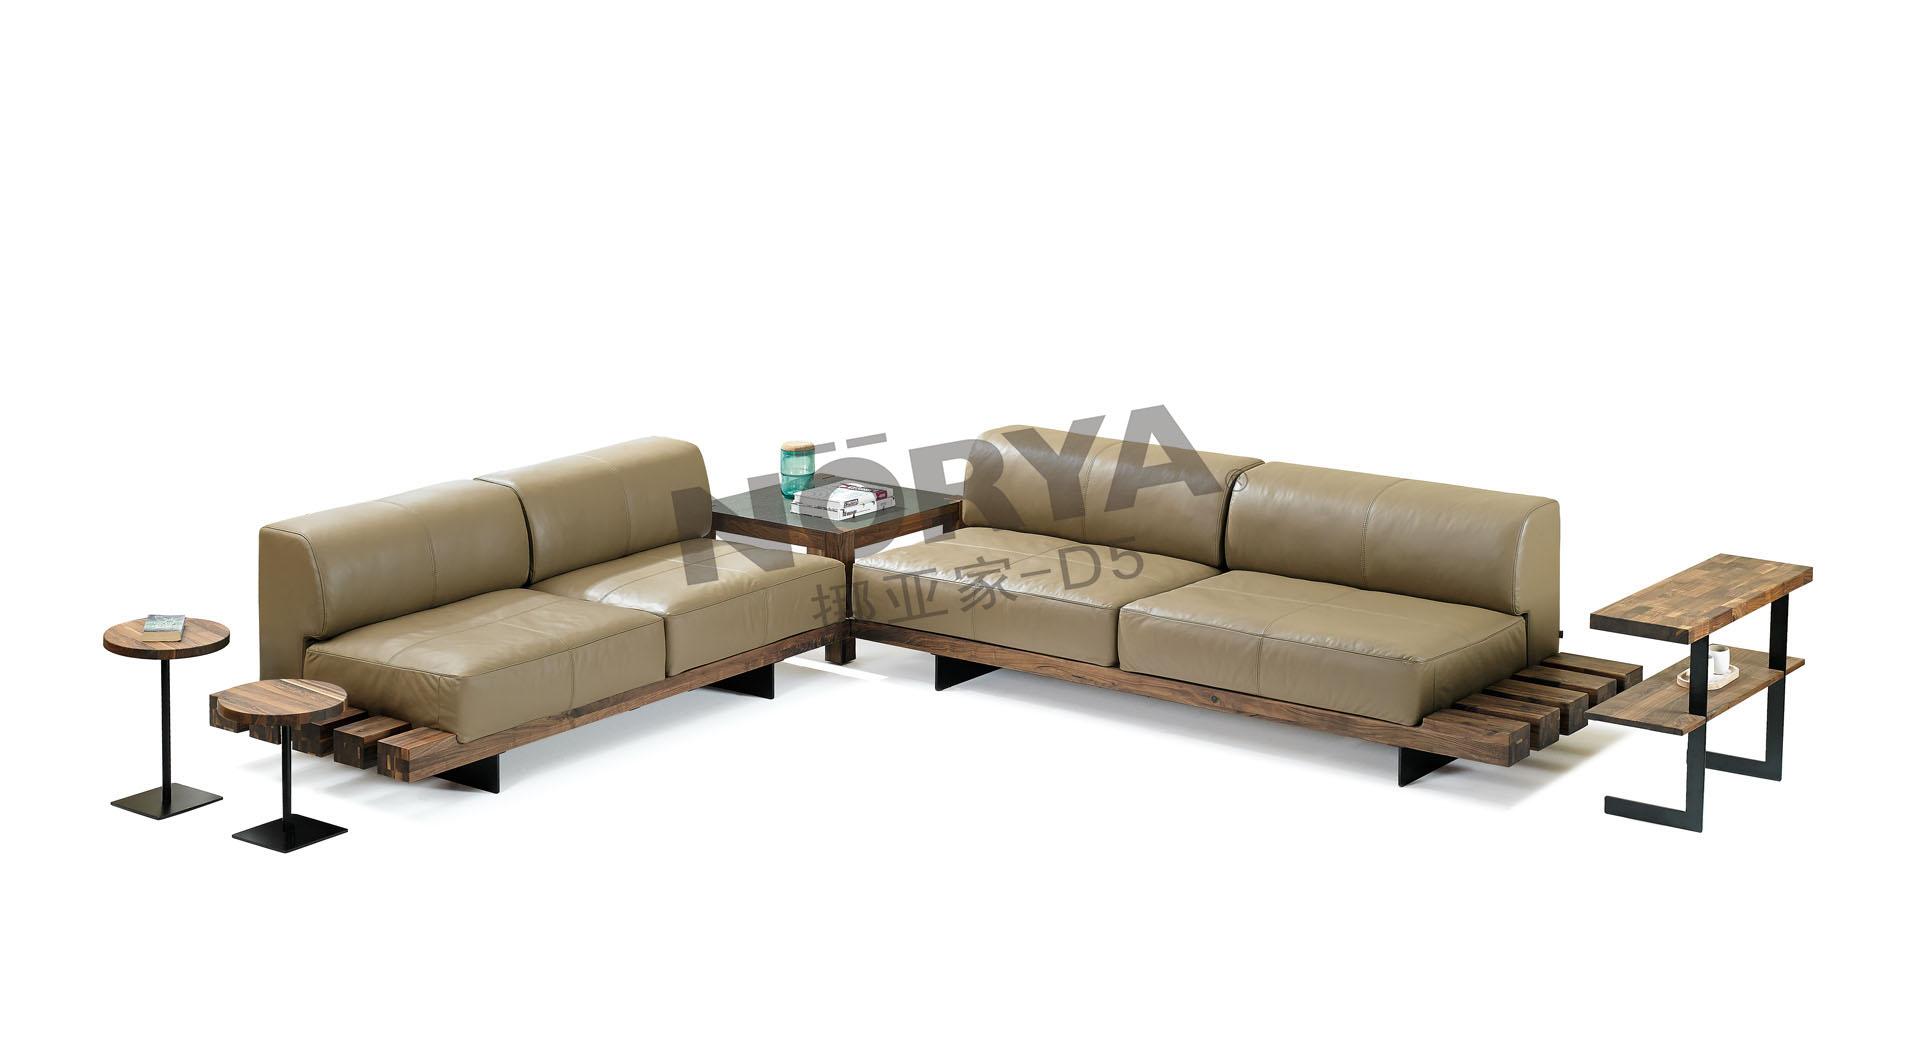 D5系列客厅家具